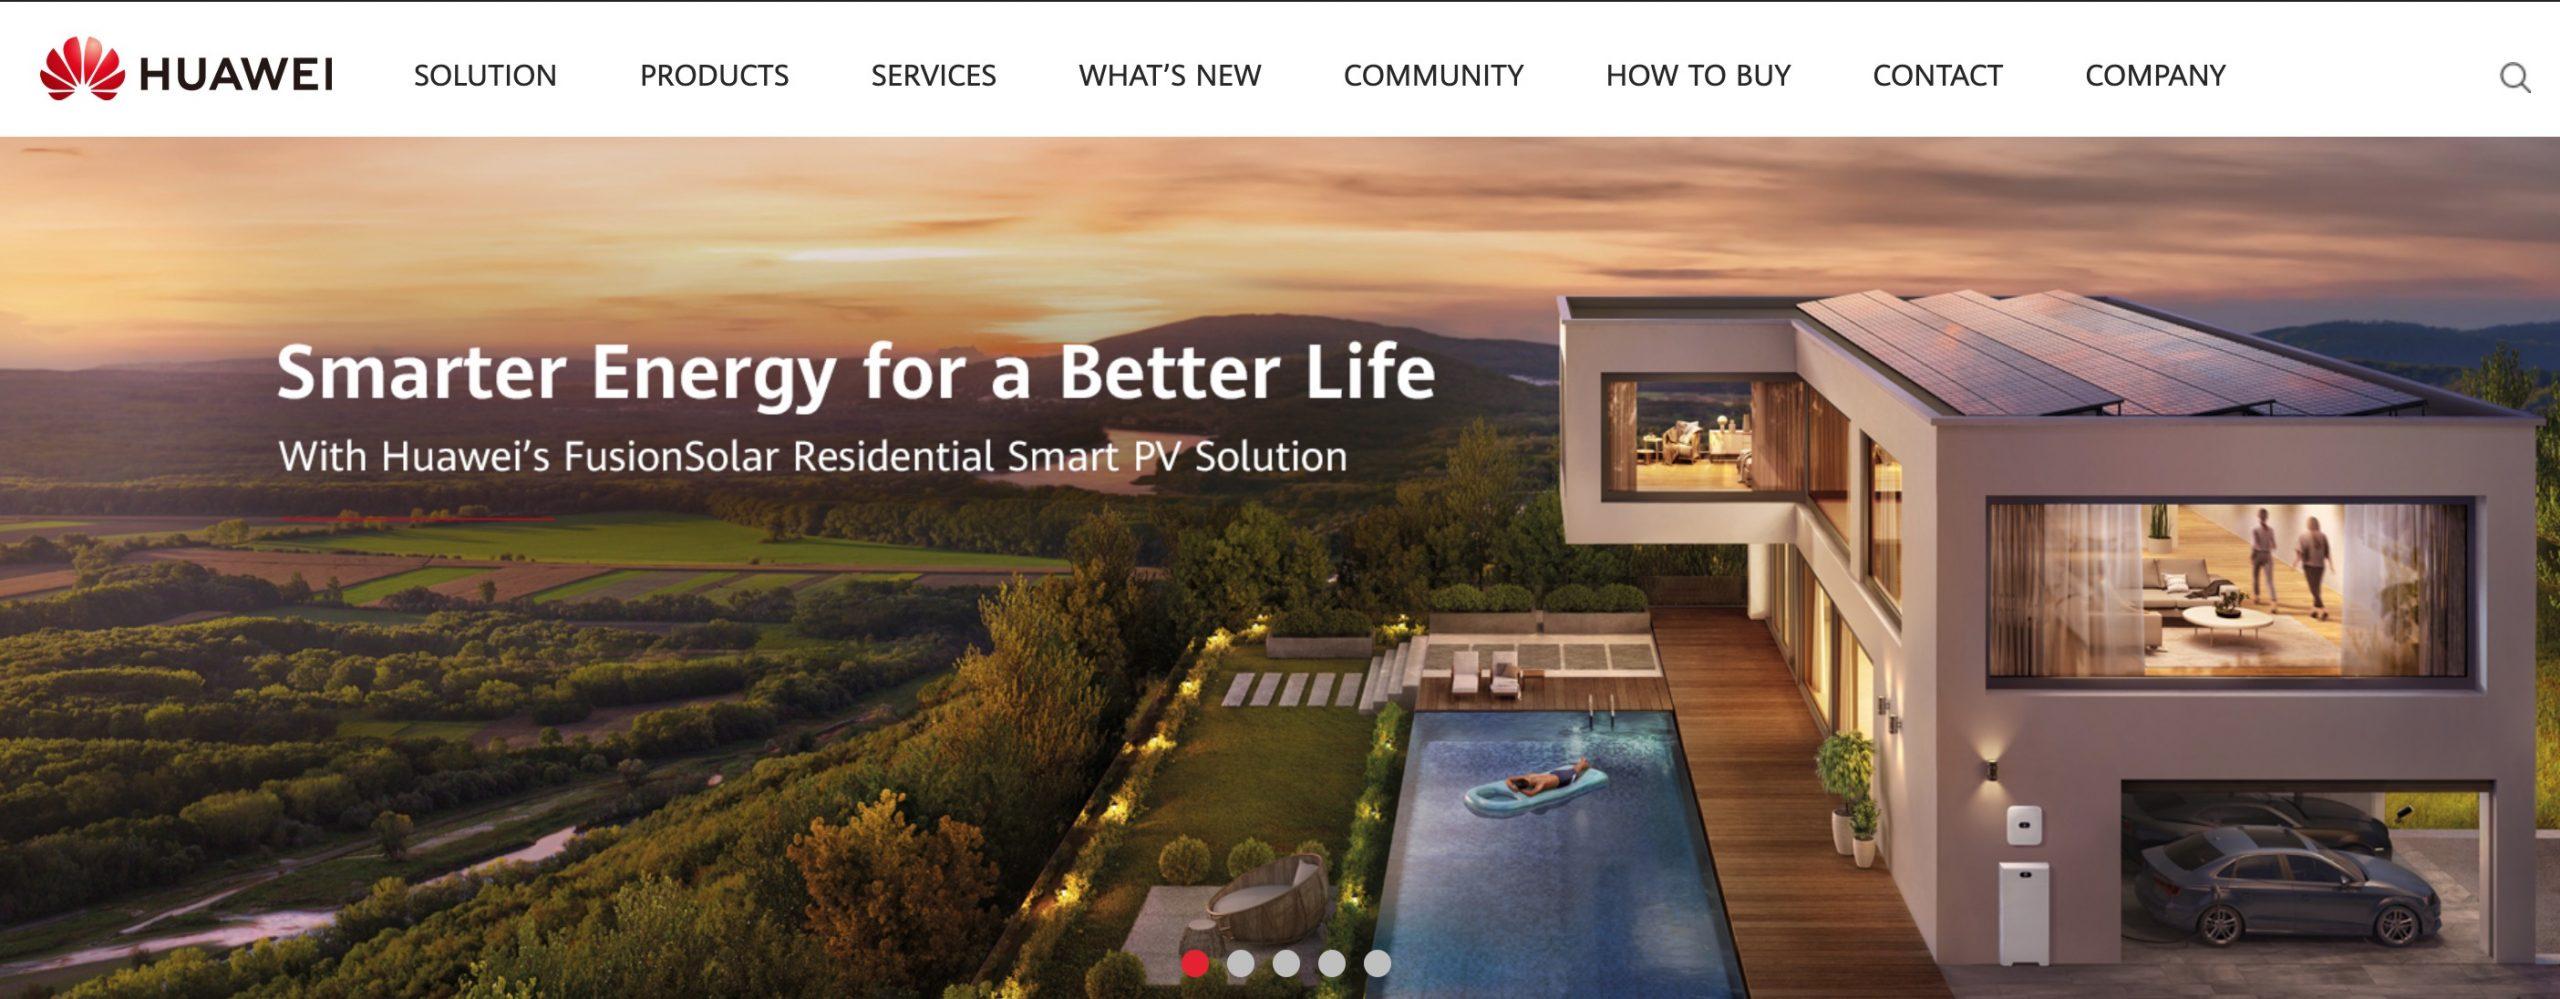 Huawei Solar main page